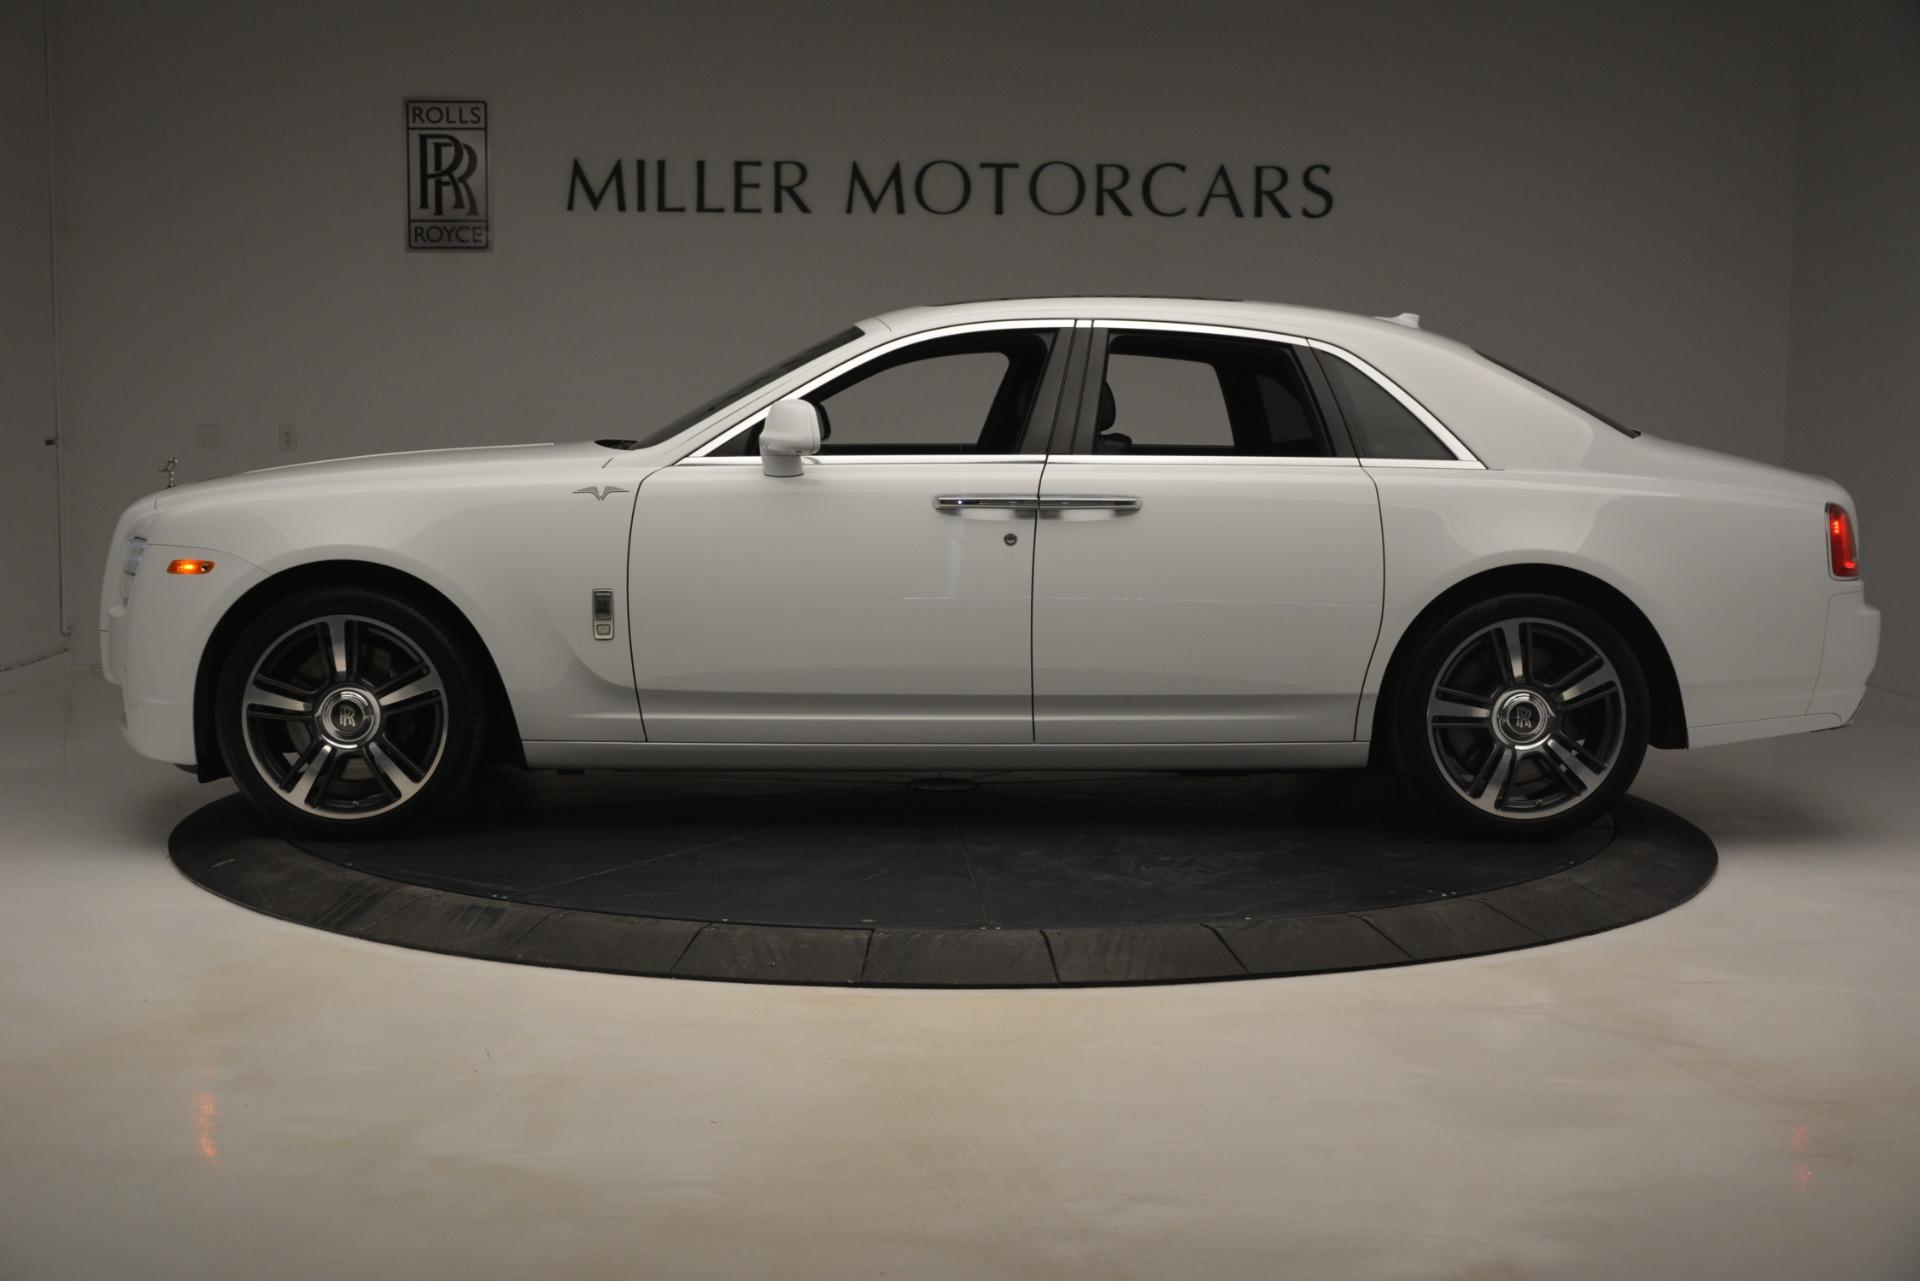 Used 2014 Rolls-Royce Ghost V-Spec For Sale In Westport, CT 2989_p4